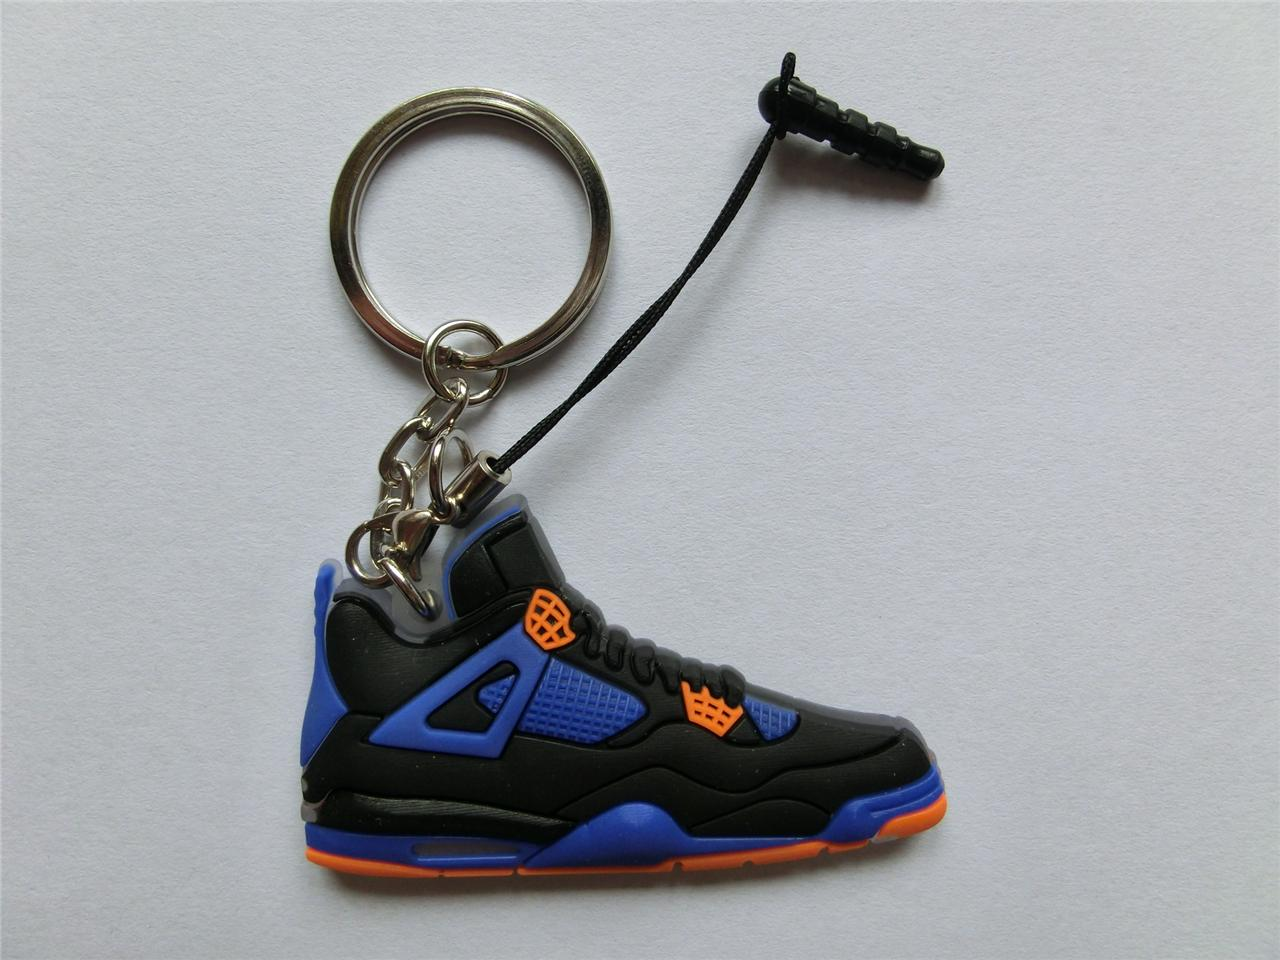 076b93a69779 Air Jordan 1 Retro High Og Bg Top 3 Online Buy Jordan Factory Shop